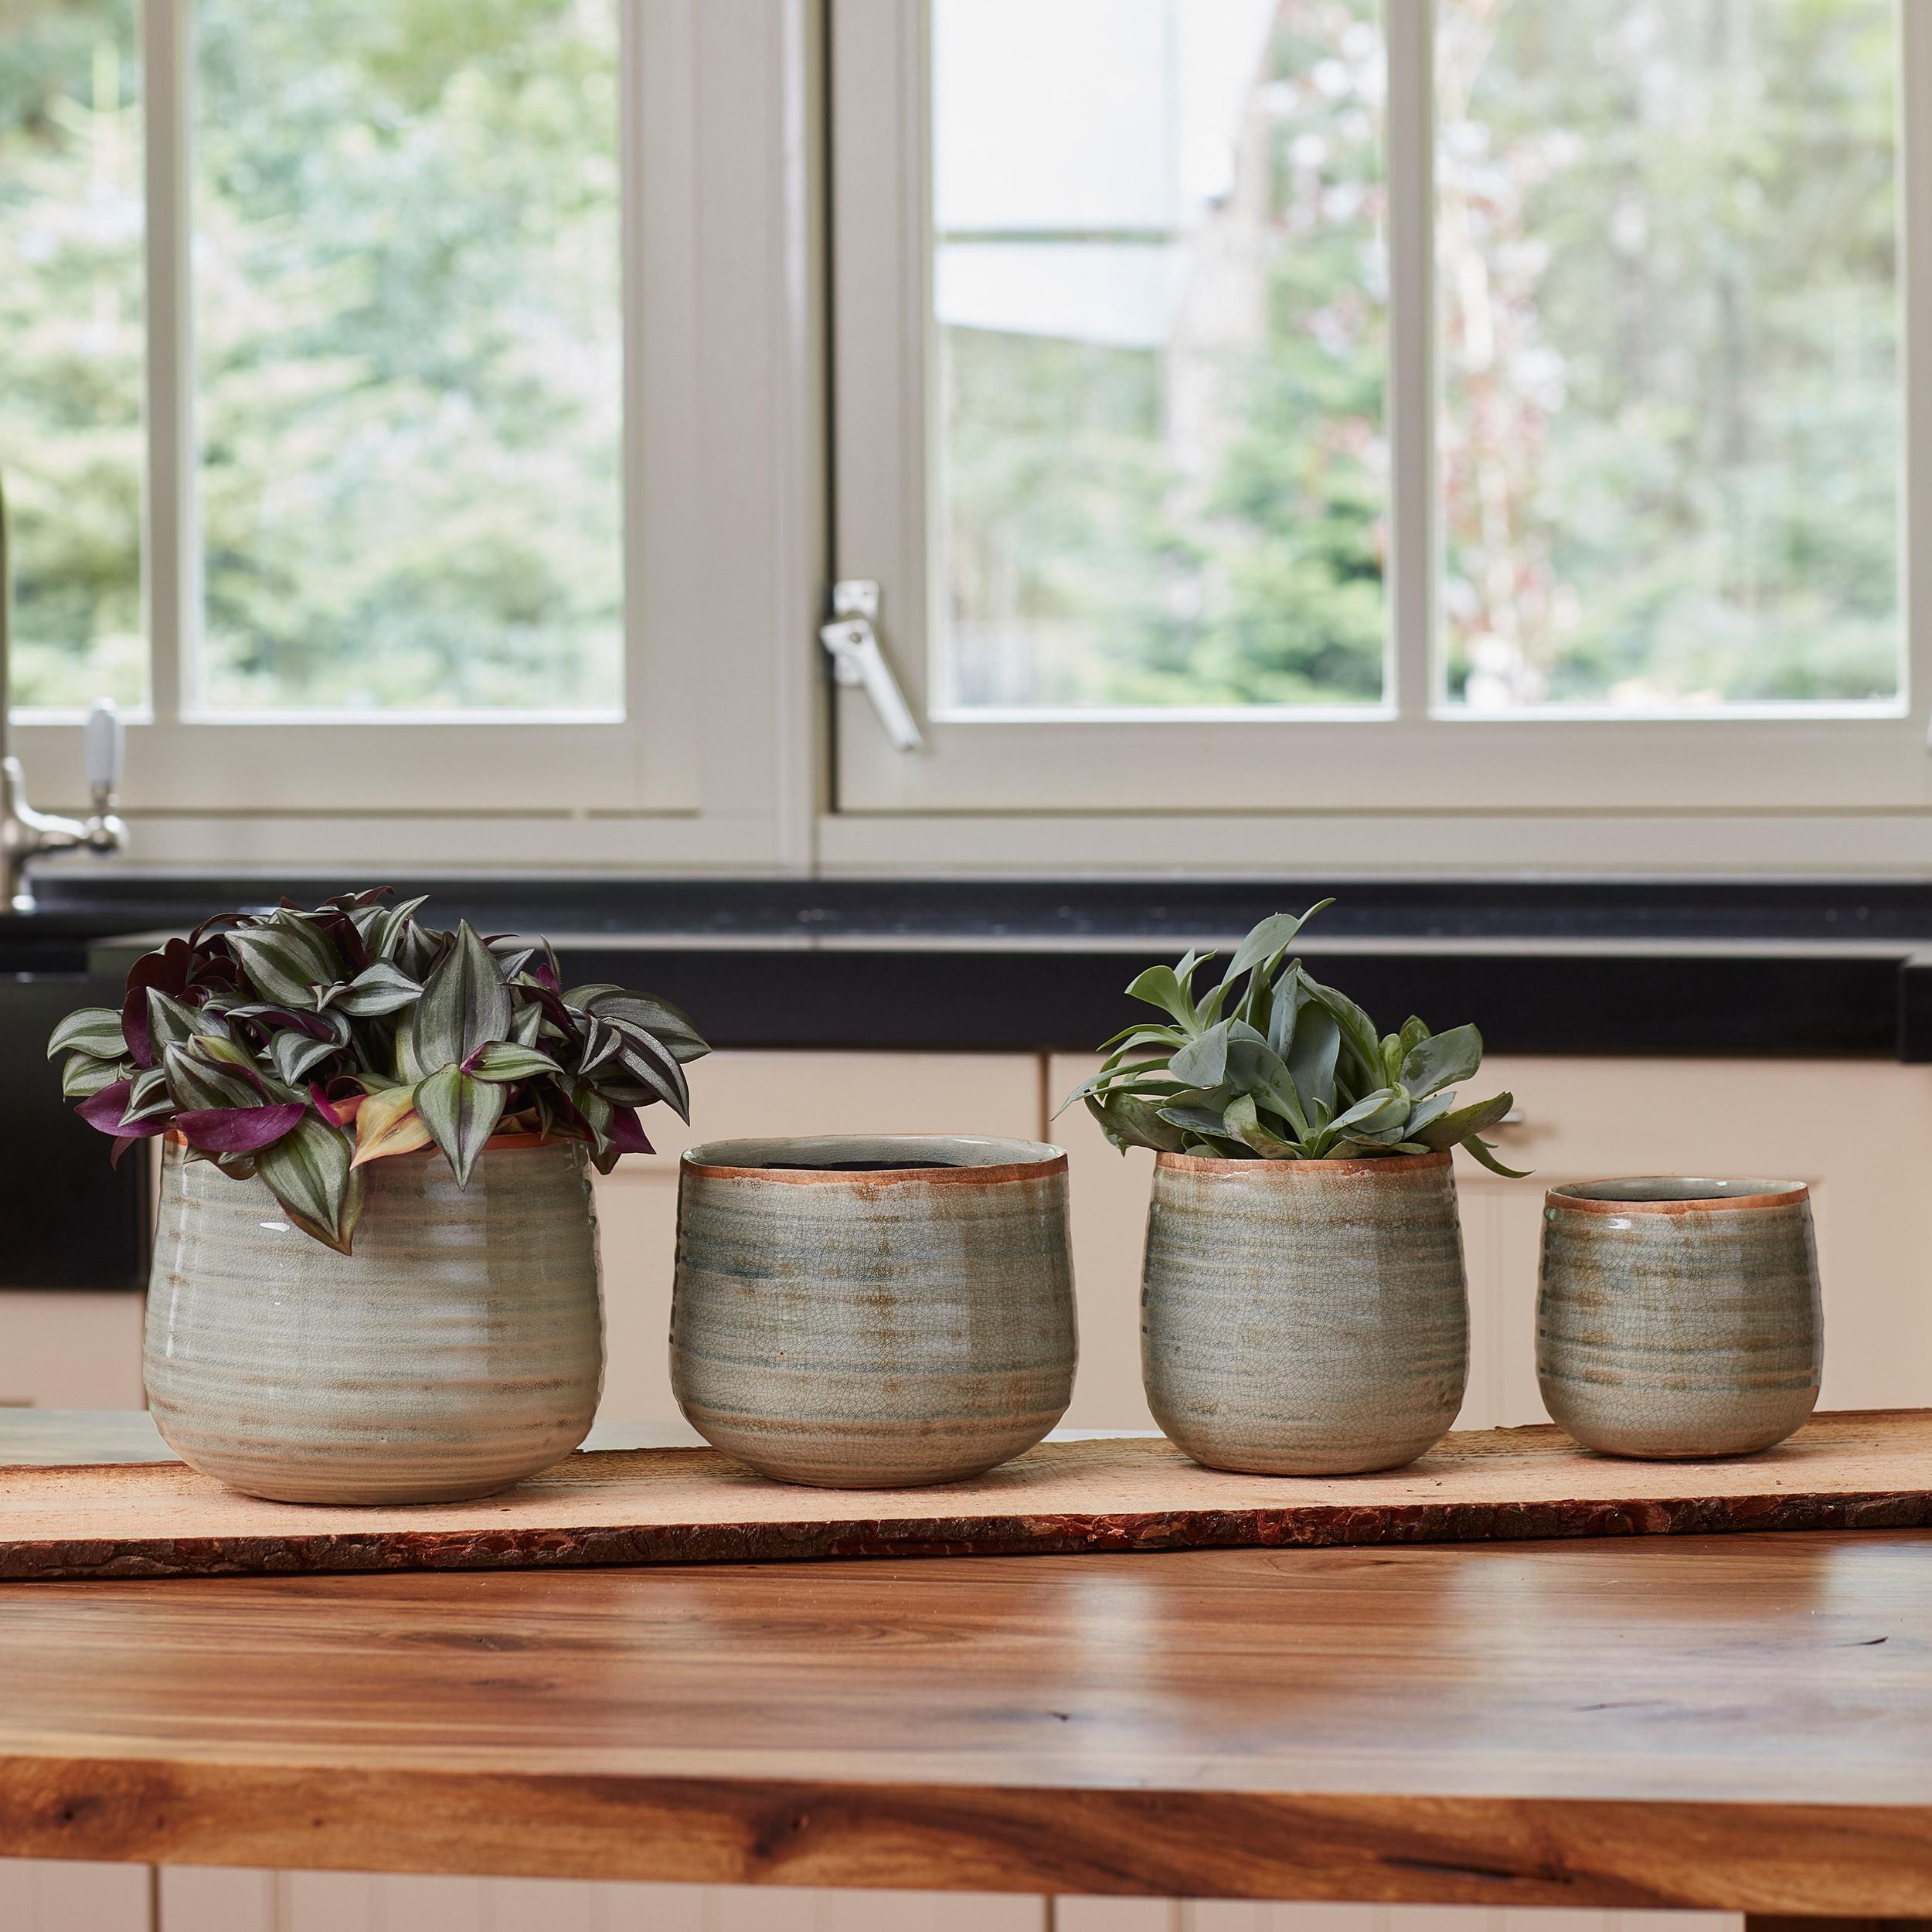 keramik blumentopf iris d15cm. Black Bedroom Furniture Sets. Home Design Ideas